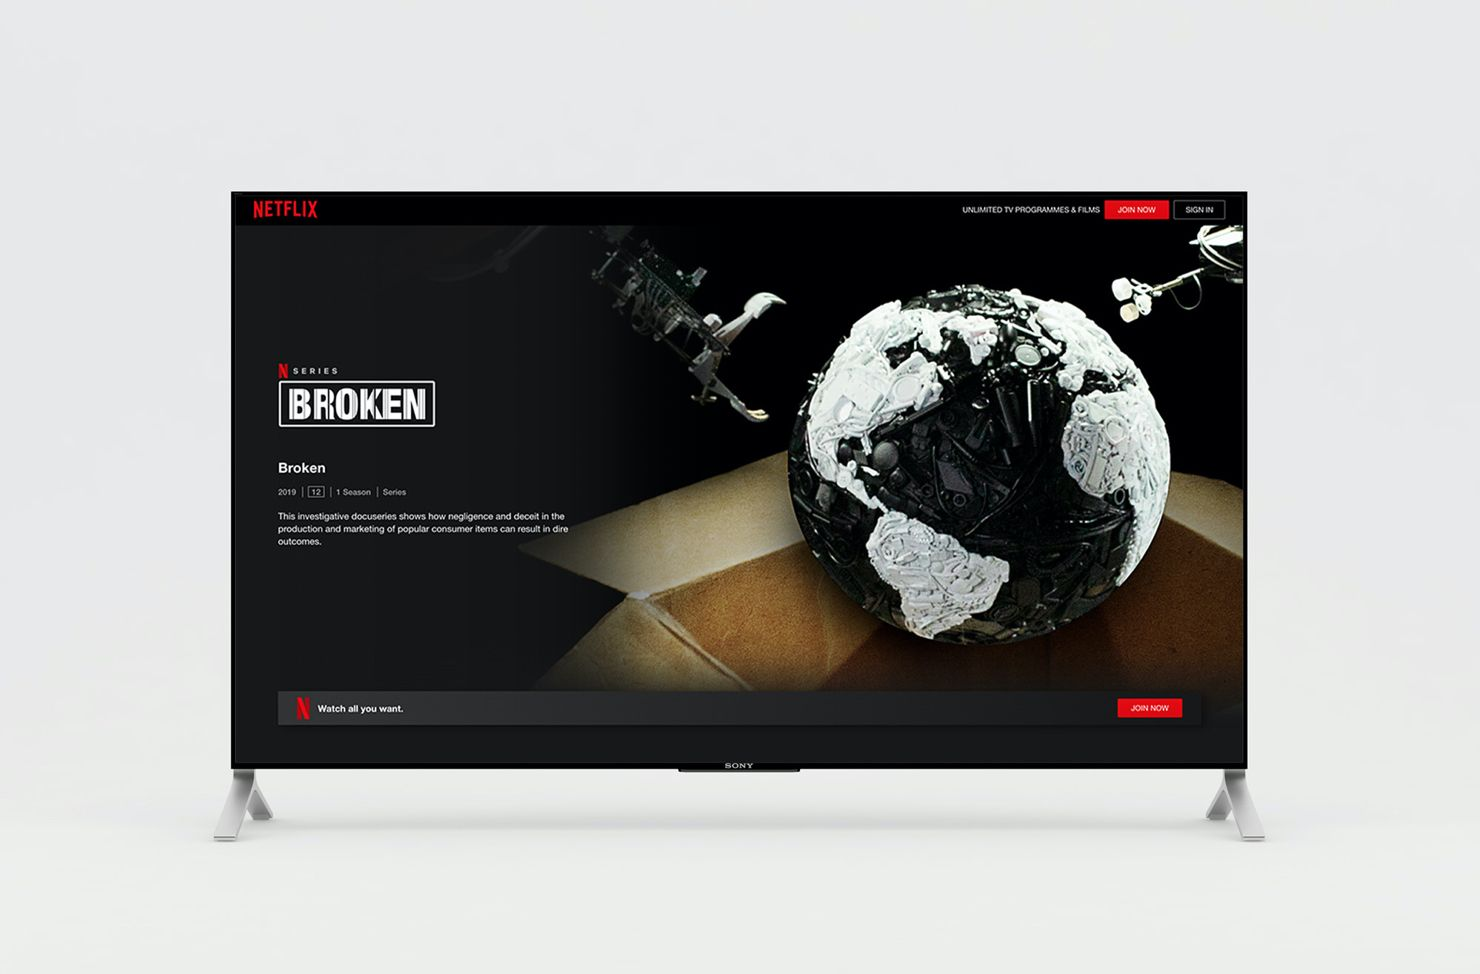 tv with Netflix on